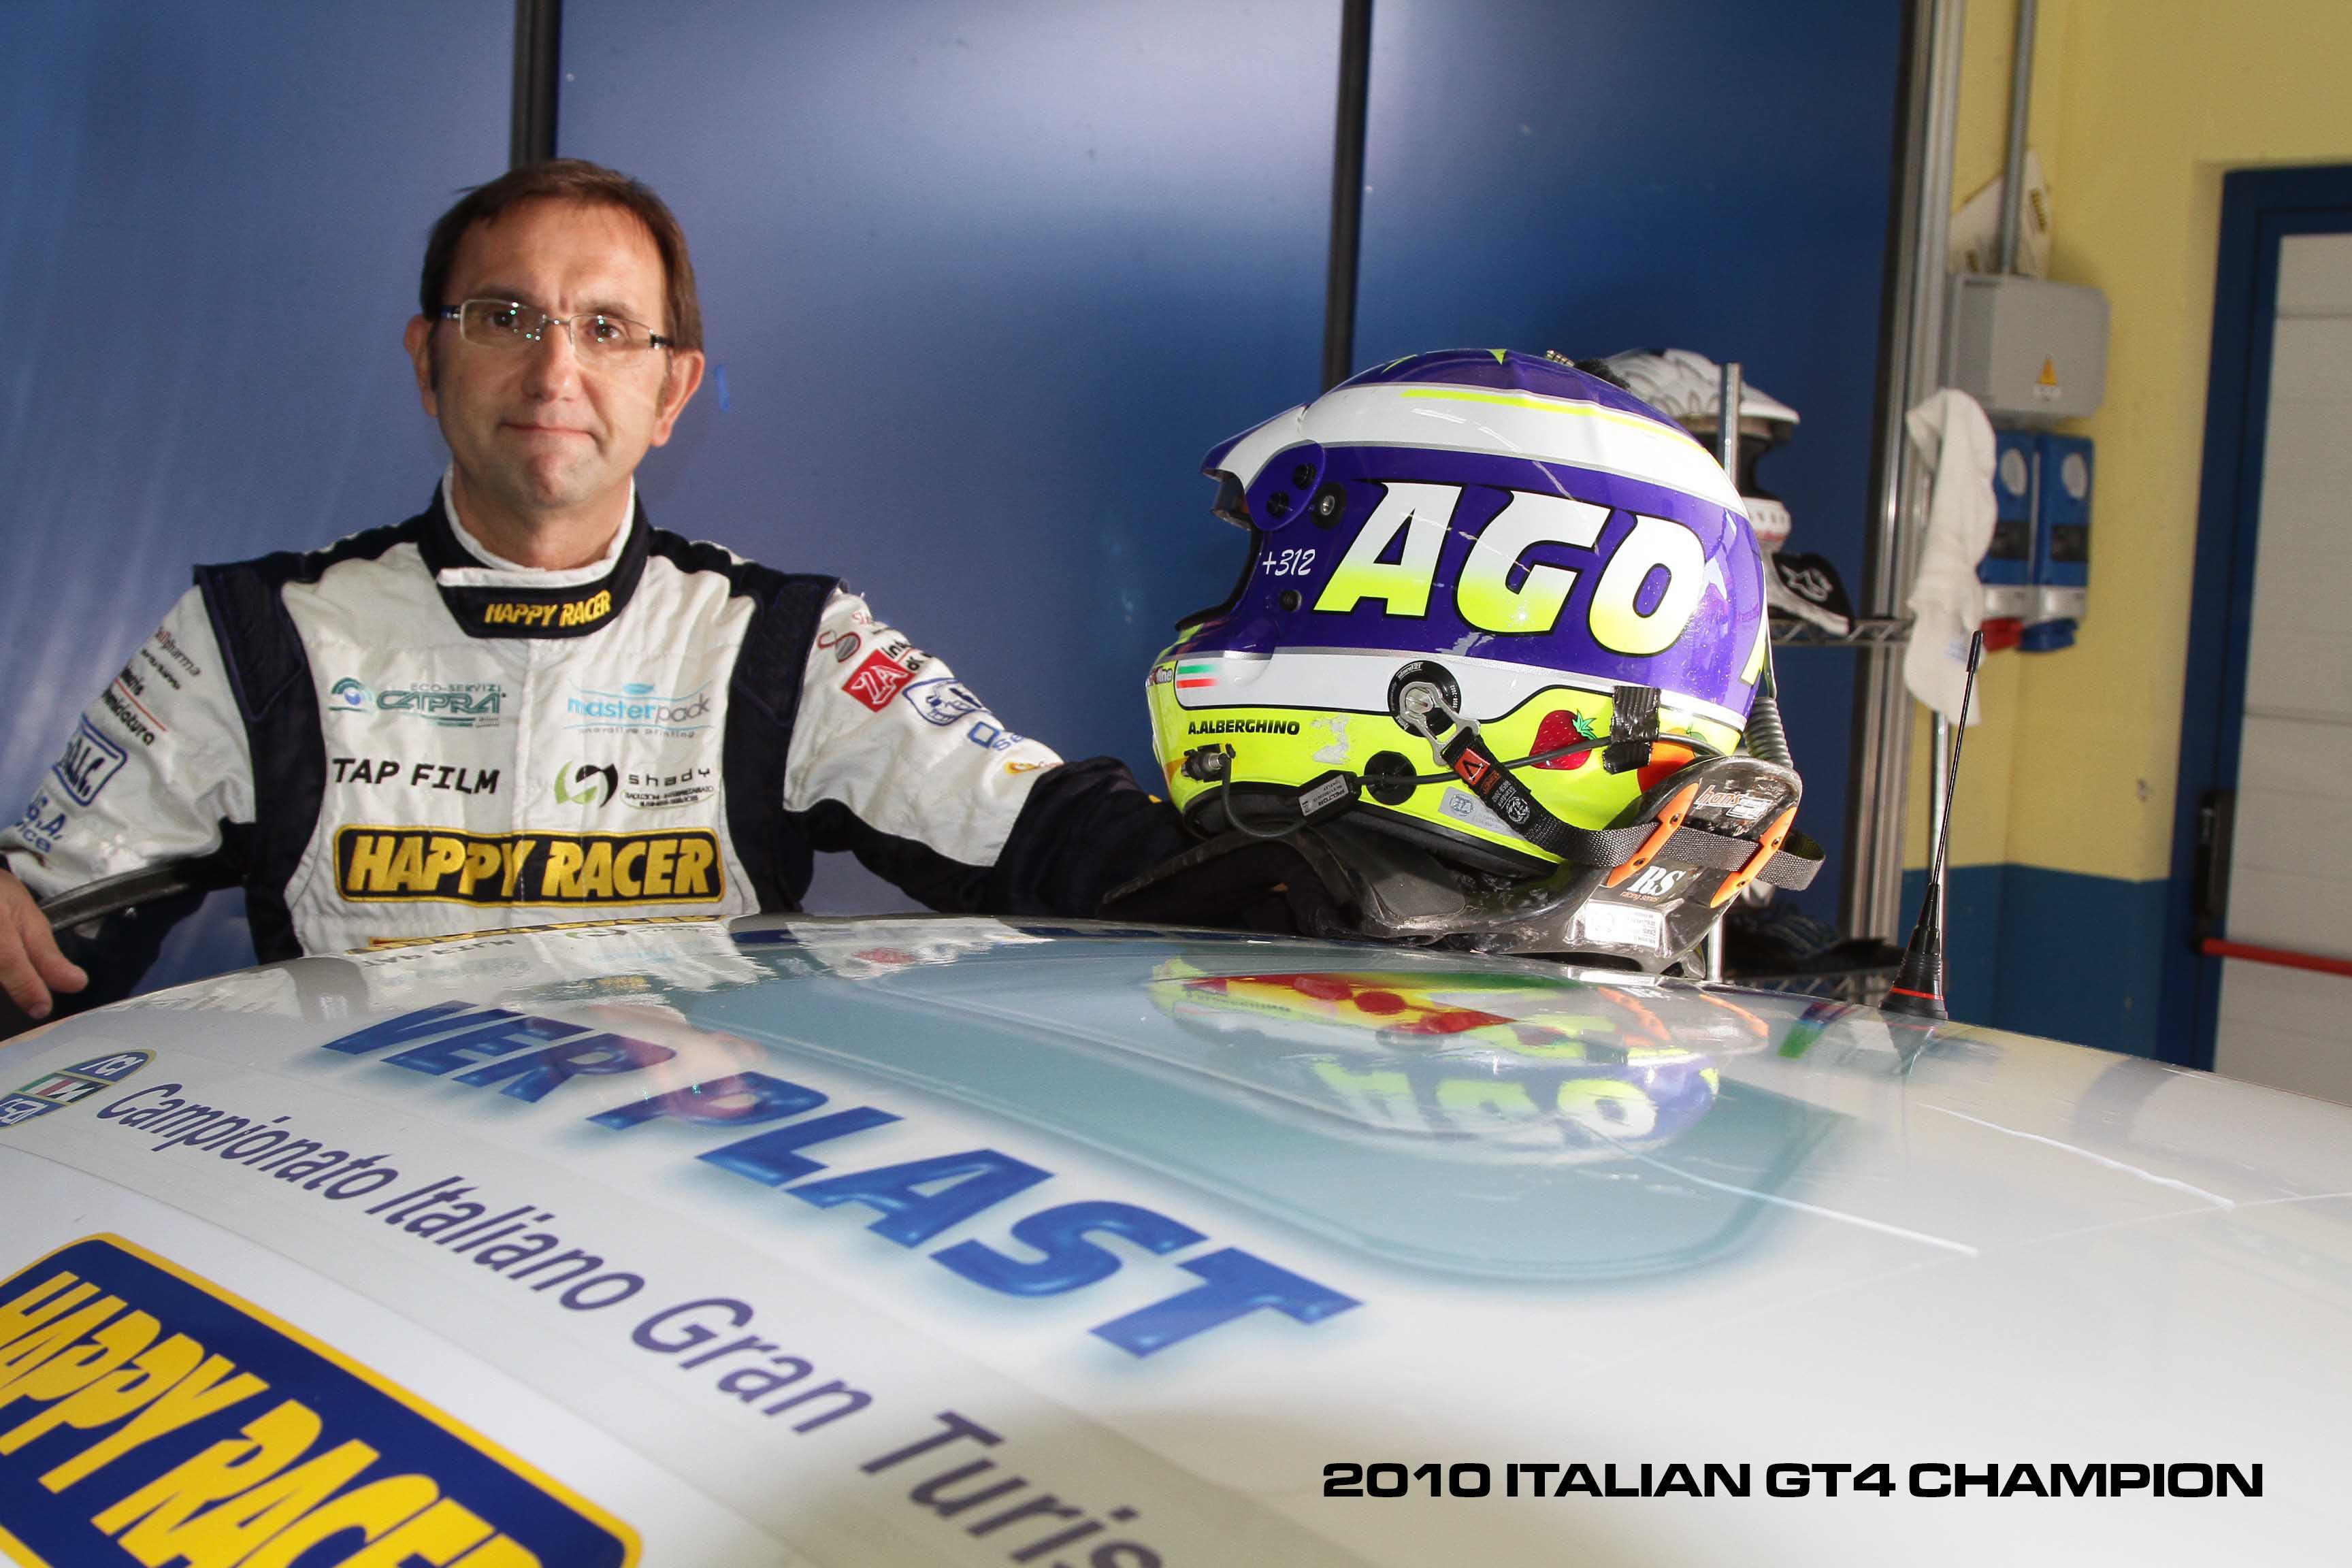 ago-2010-gt4-champion-original